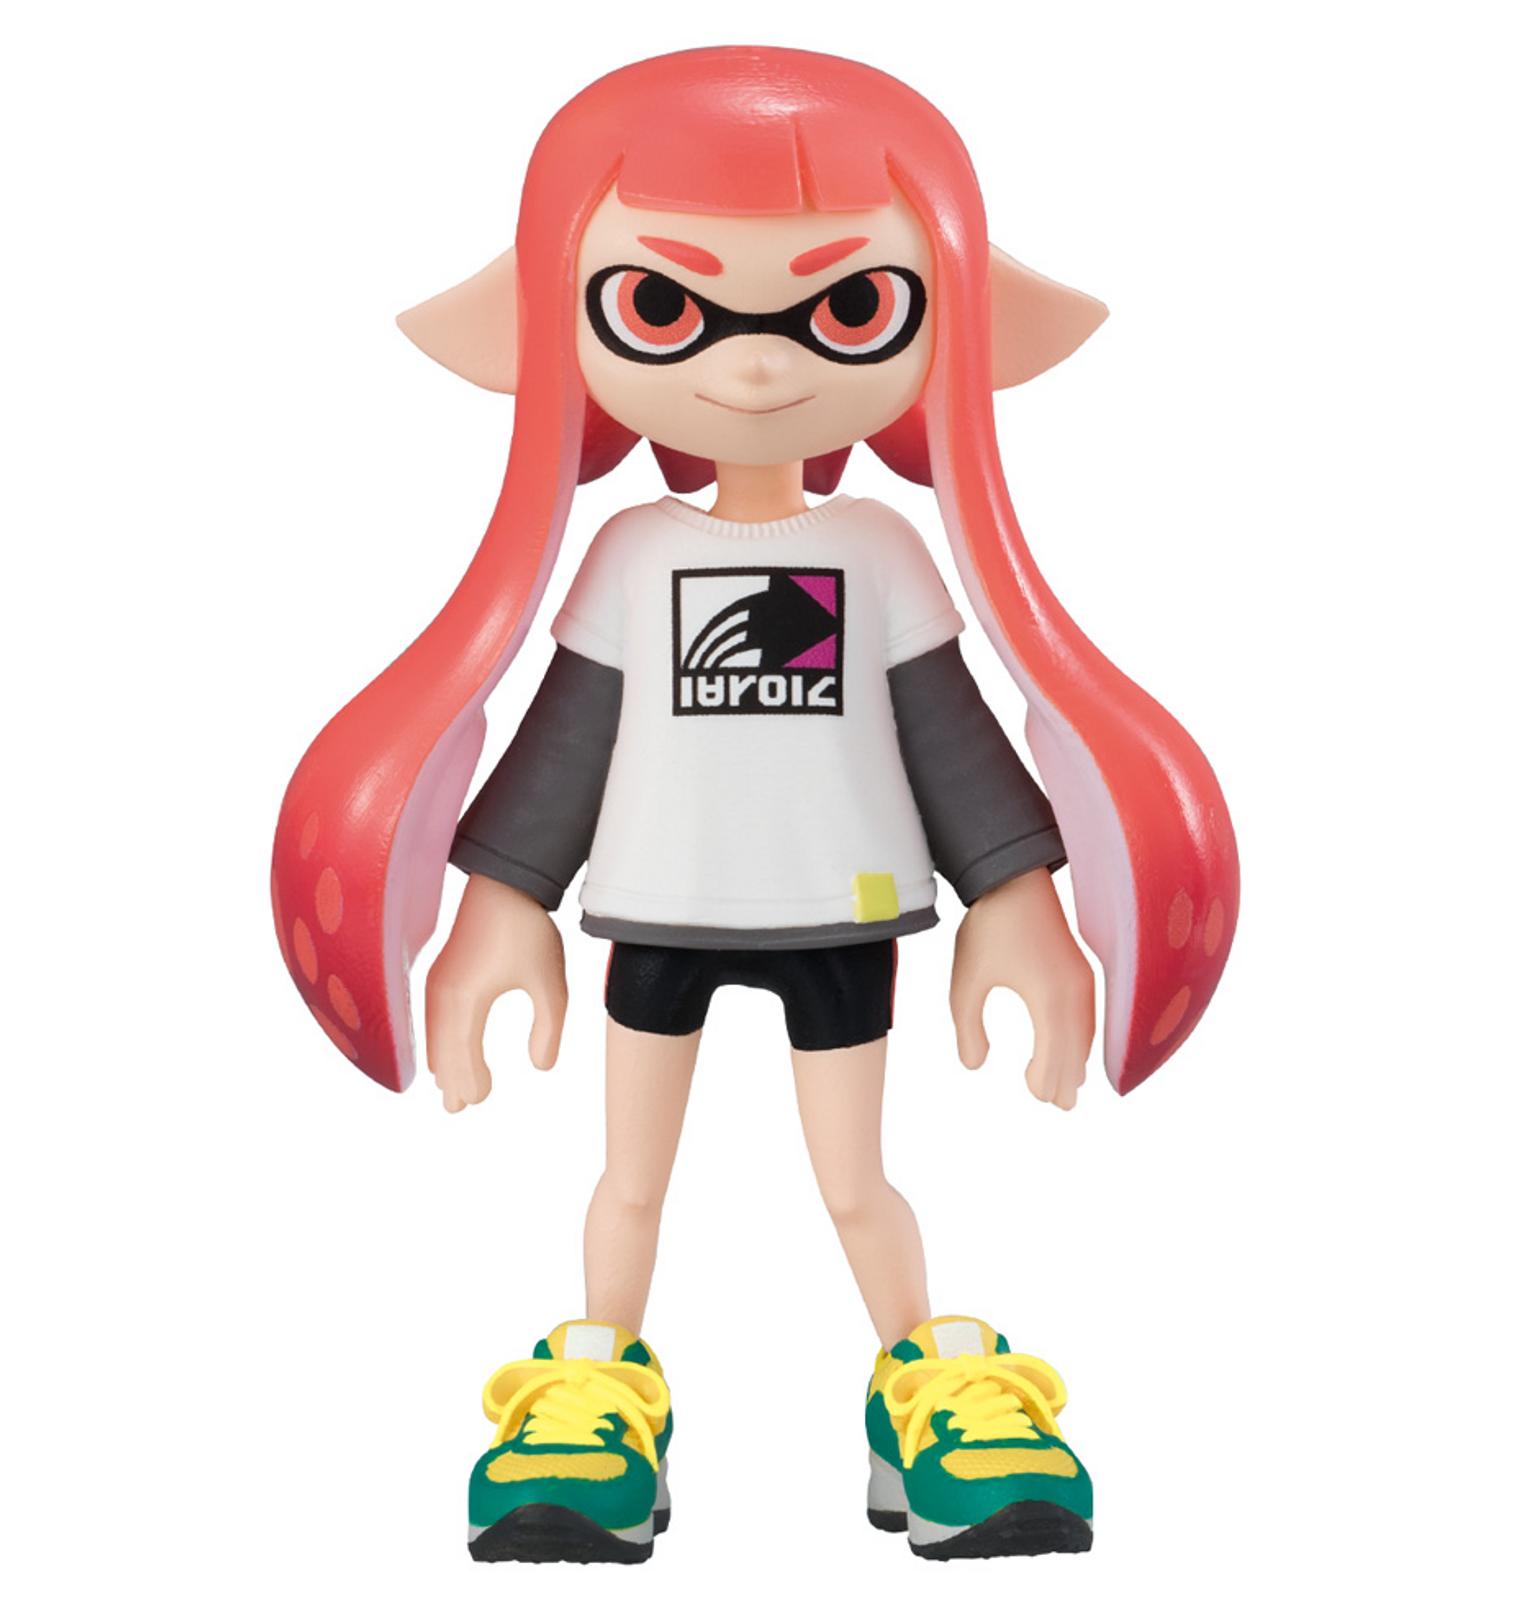 Splatoon 2 Dress-up Figure Gear Collection 2 Squid GIRL 2 JAPAN Nintendo Switch